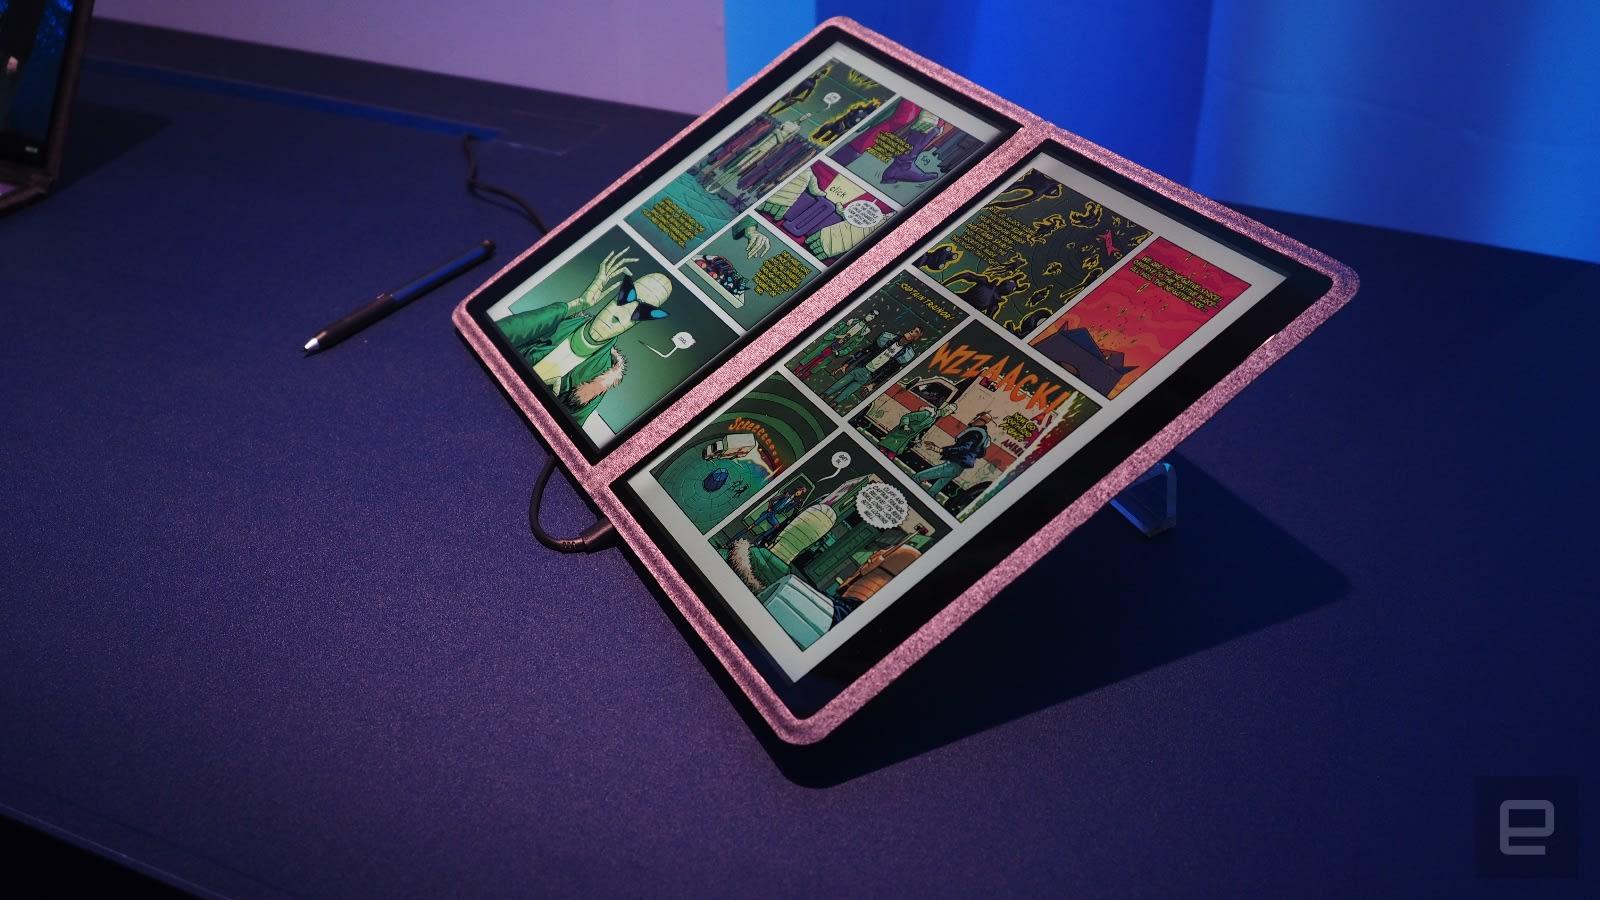 Intel Twin Rivers prototype 2-in-1 laptop hands-on